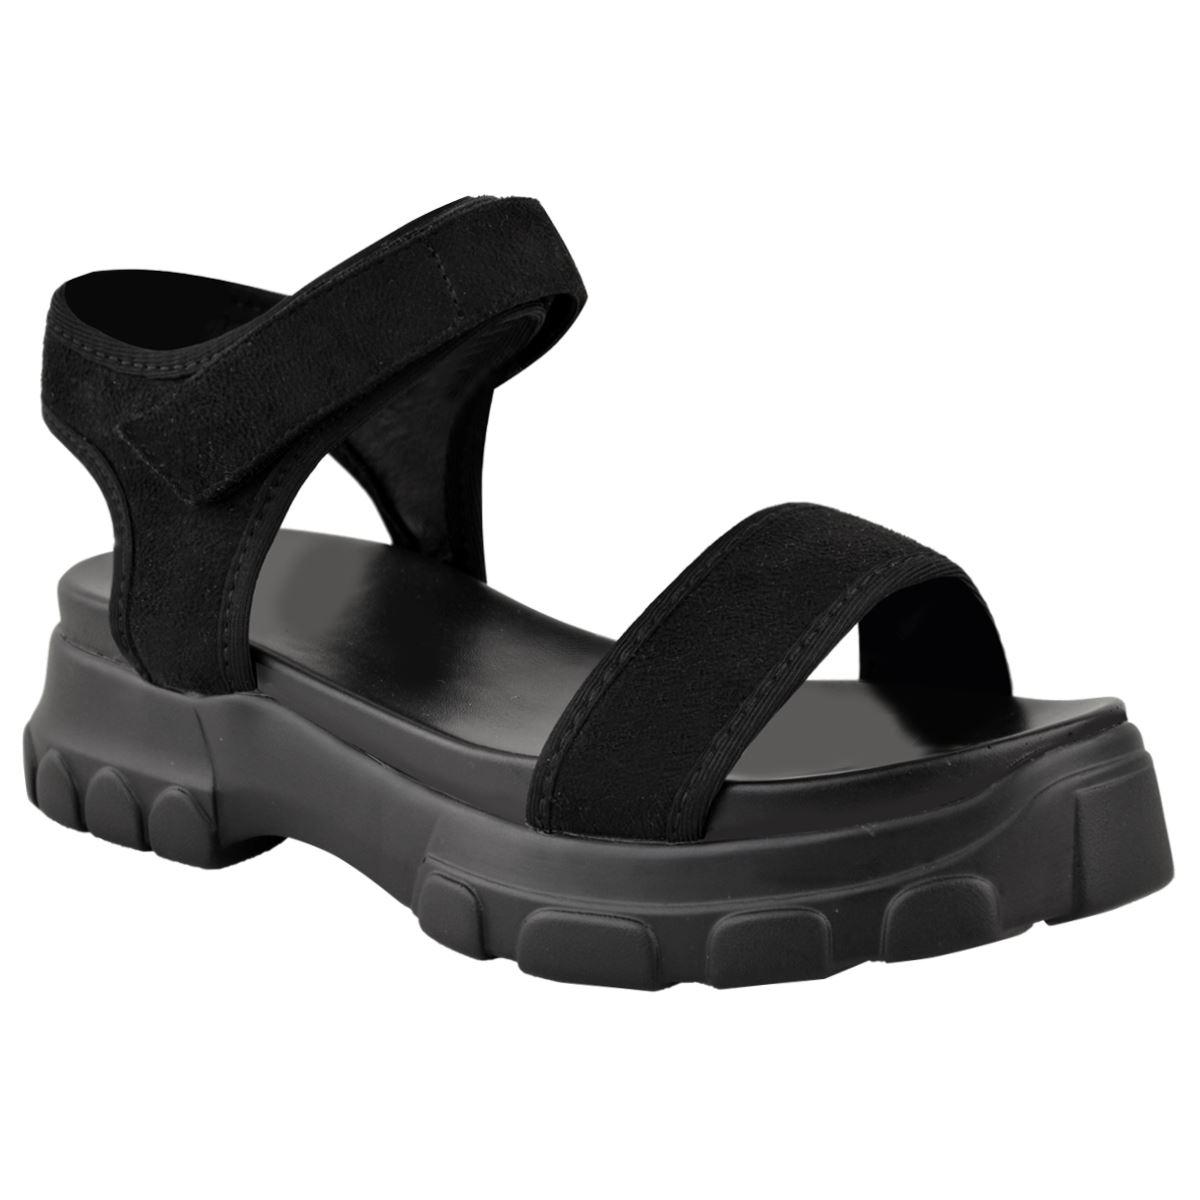 20378bd4054 Womens Ladies Flat Chunky Sandals Flatform Grip Platform Sole ...